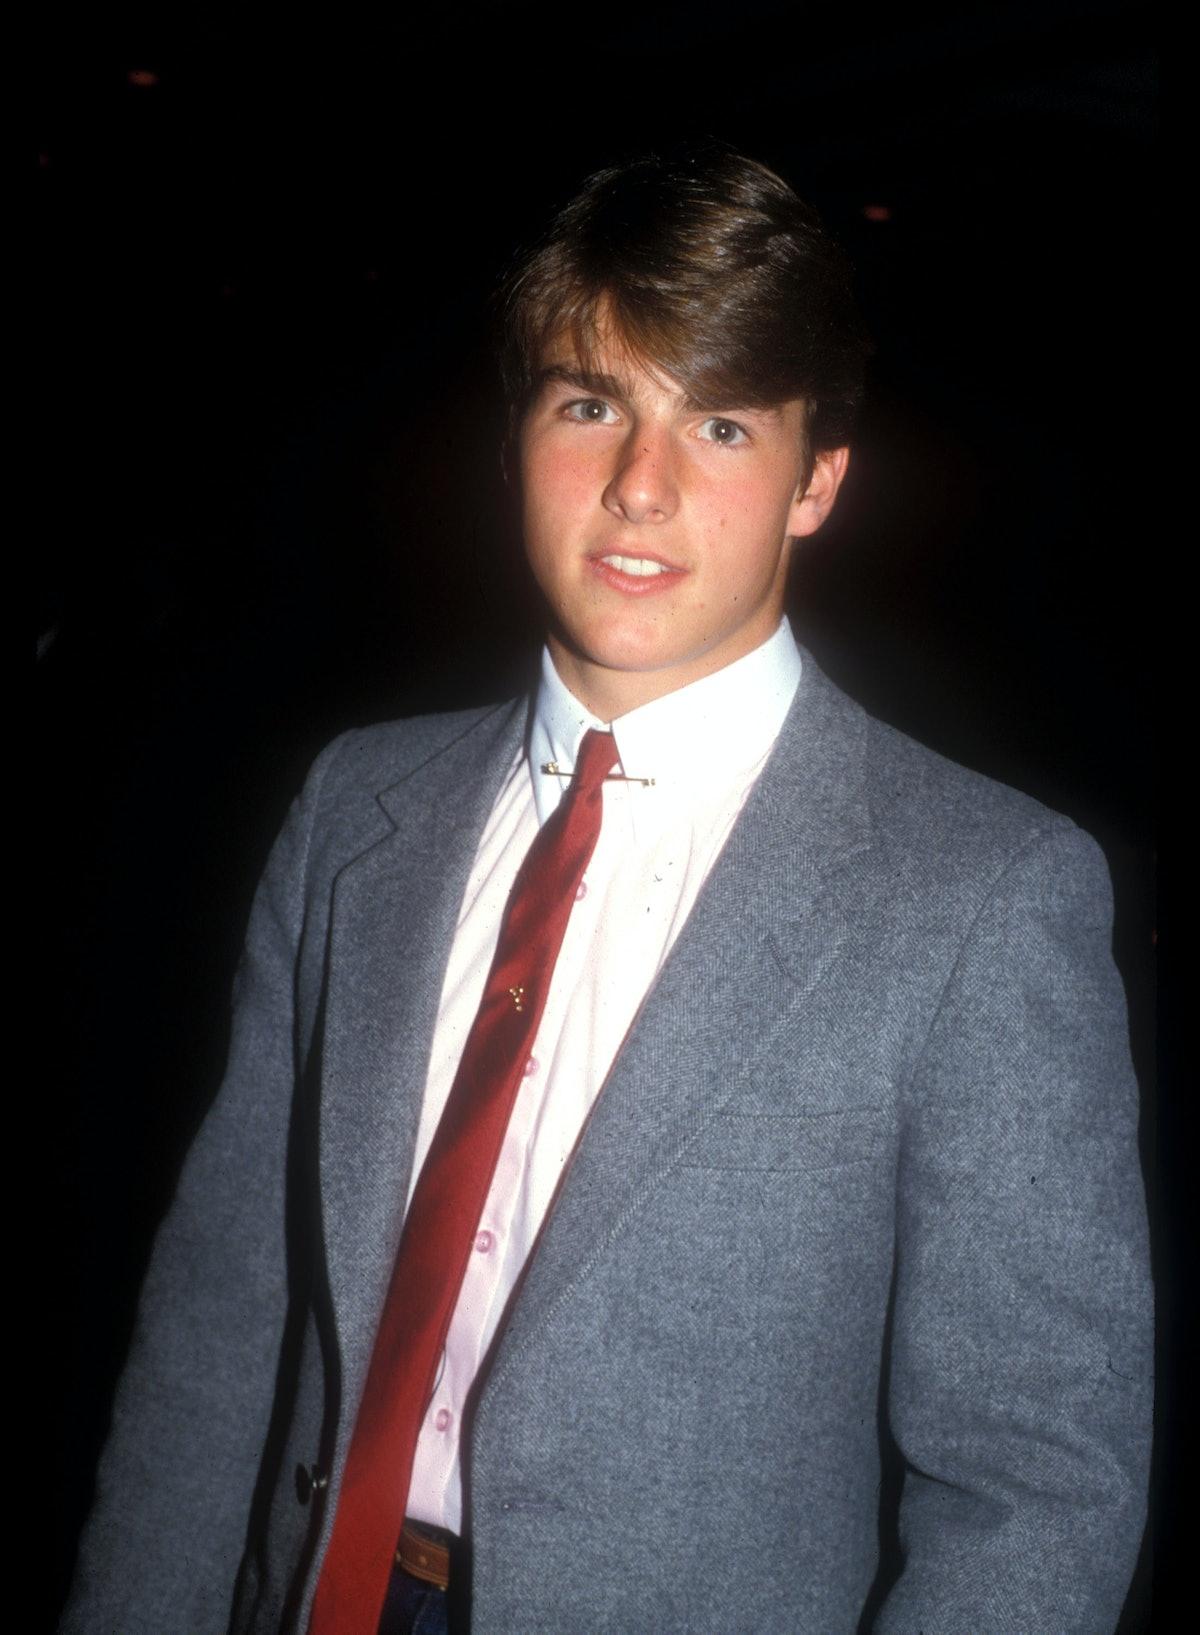 Tom Cruise File Photo